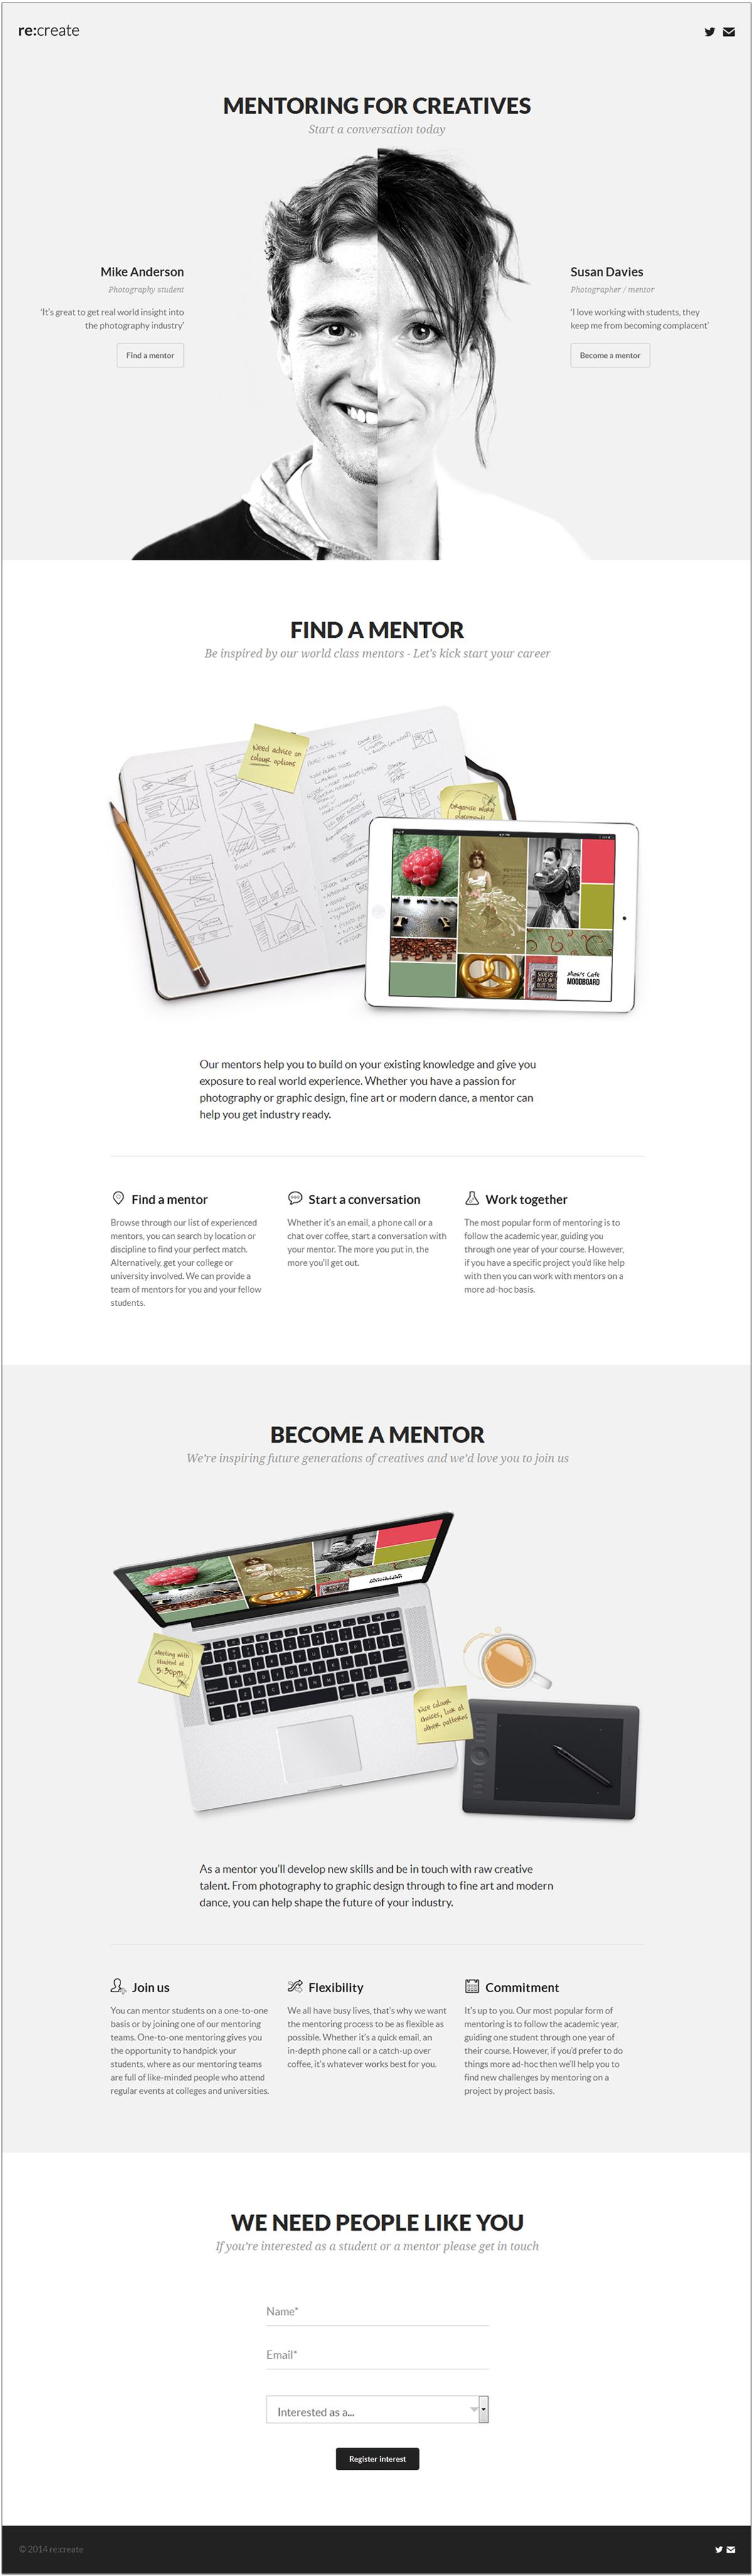 Daily Web Design And Development Inspirations No 424 Web Development Design Web Design Inspiration Creative Web Design